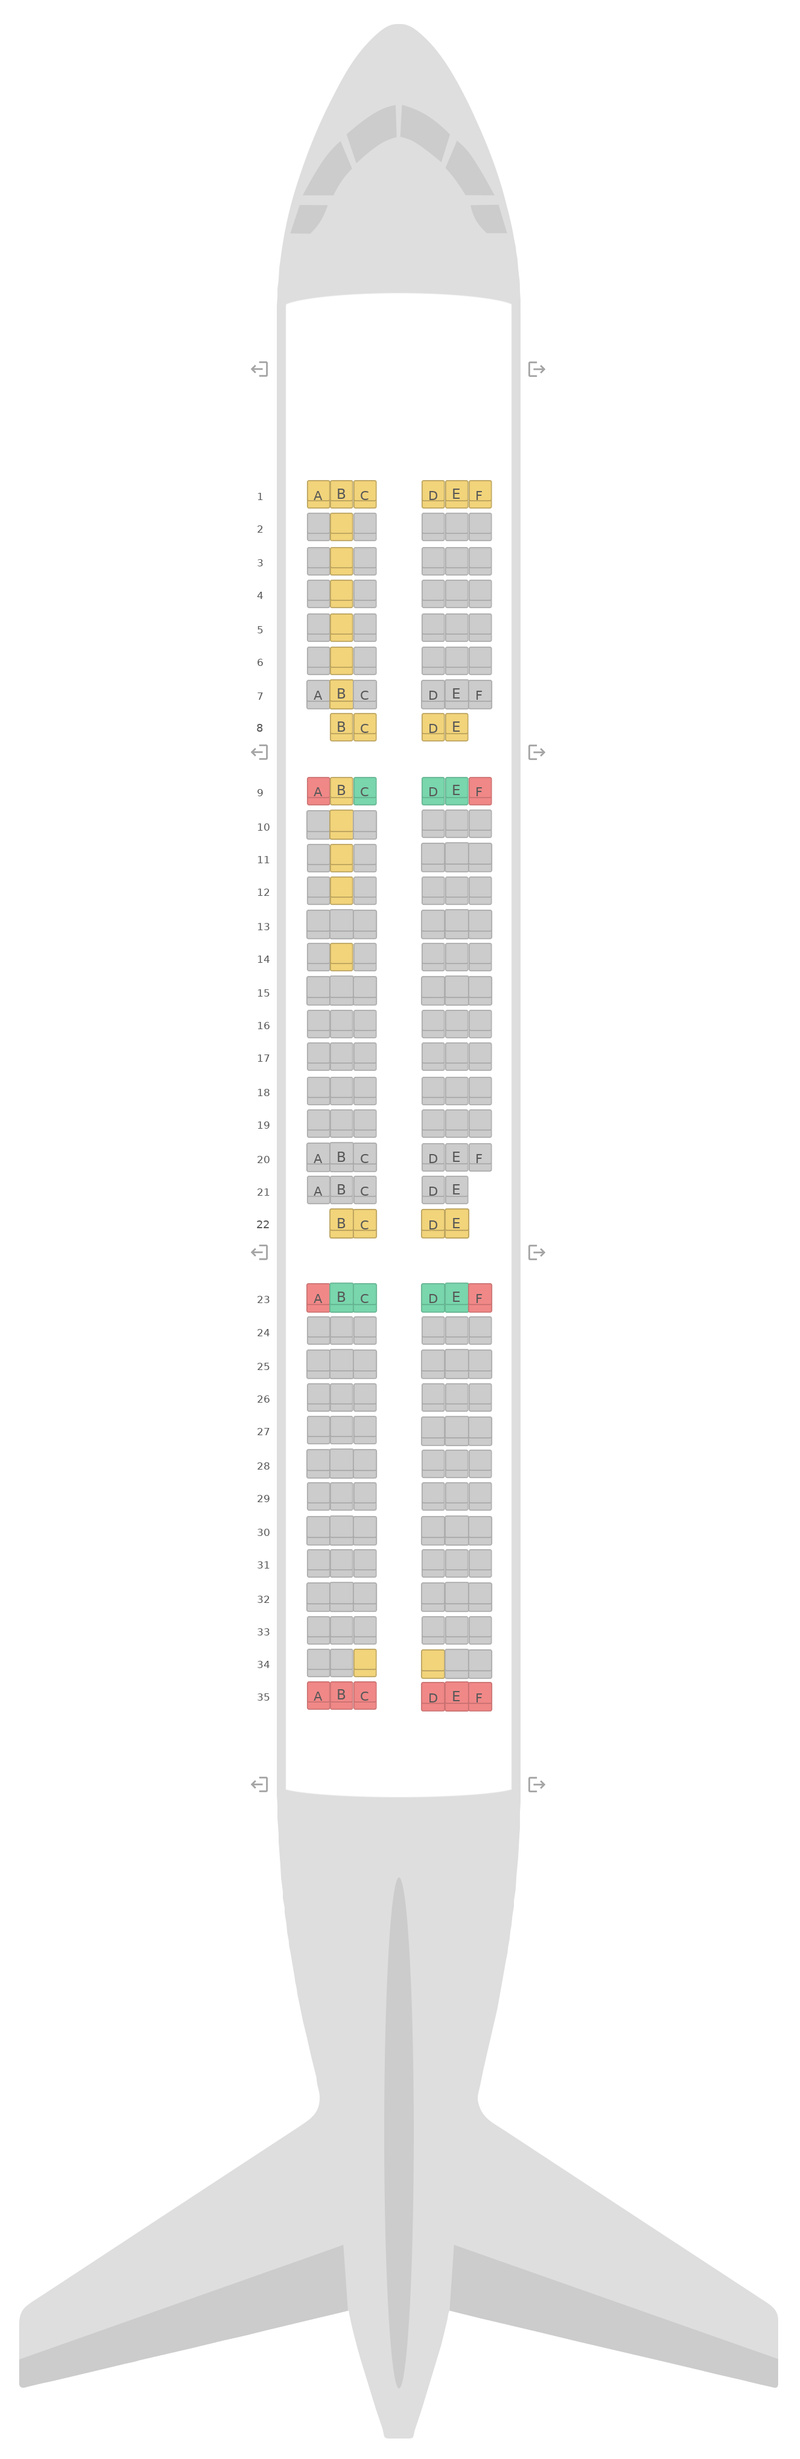 Seat Map Airbus A321 v3 British Airways